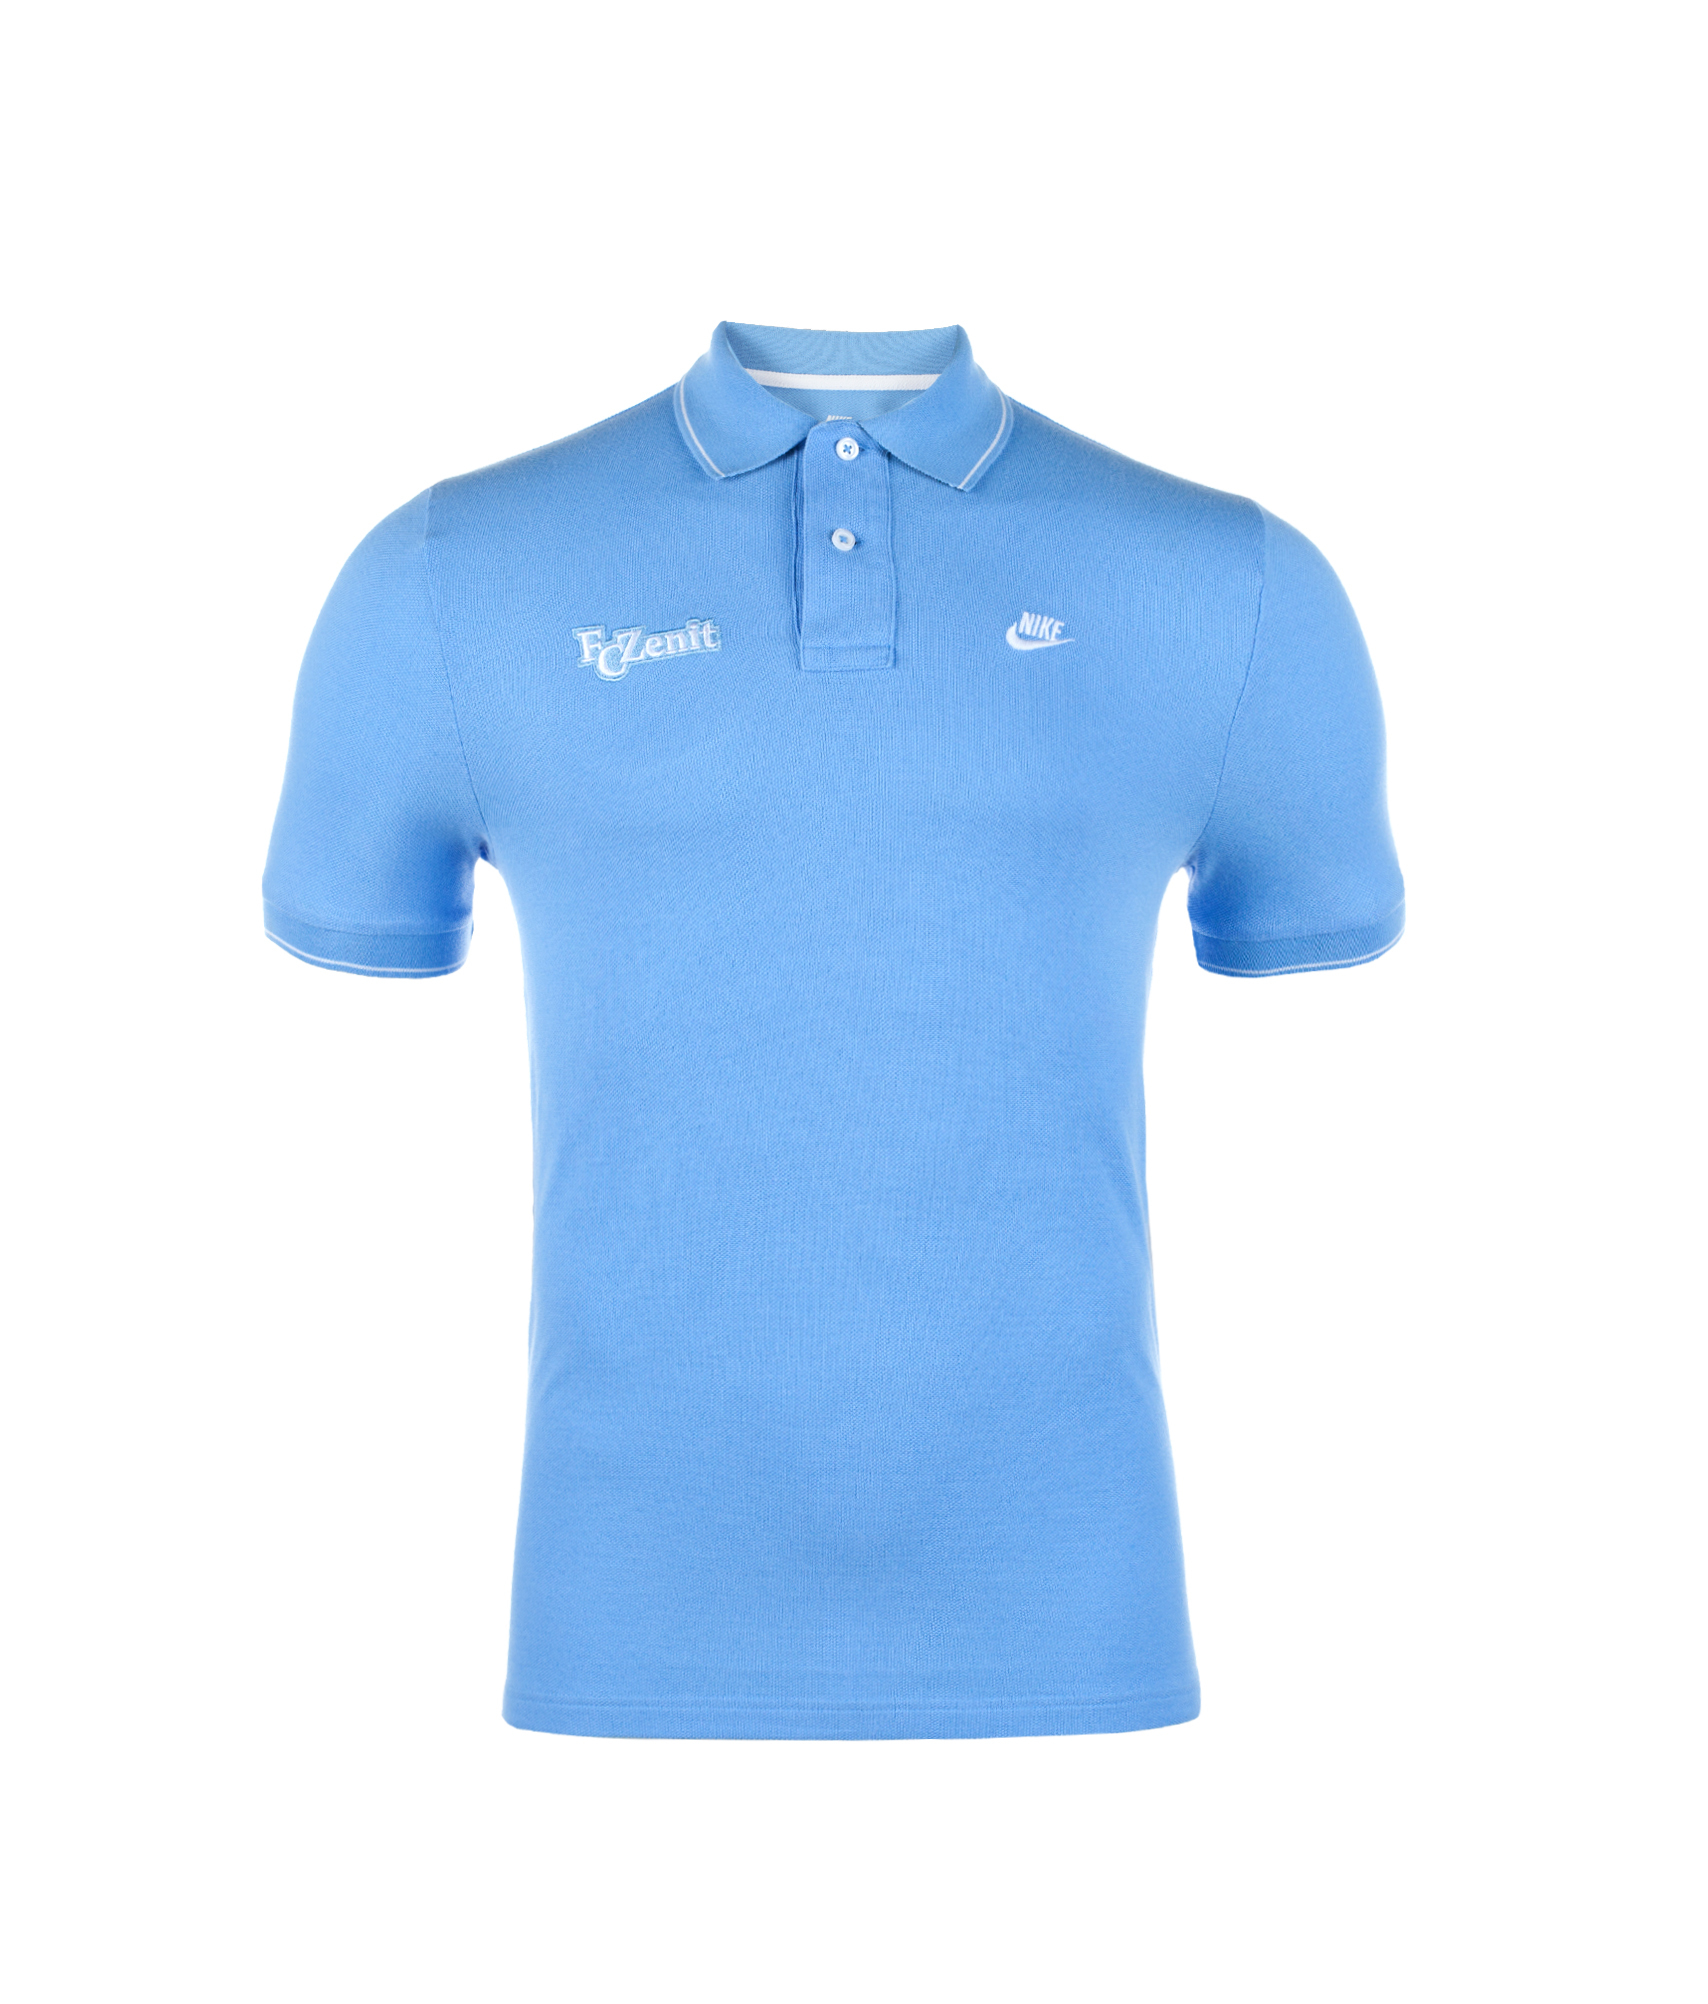 Поло Nike SUMMERIZED TIPPED GS POLO, Цвет-Голубой, Размер-L